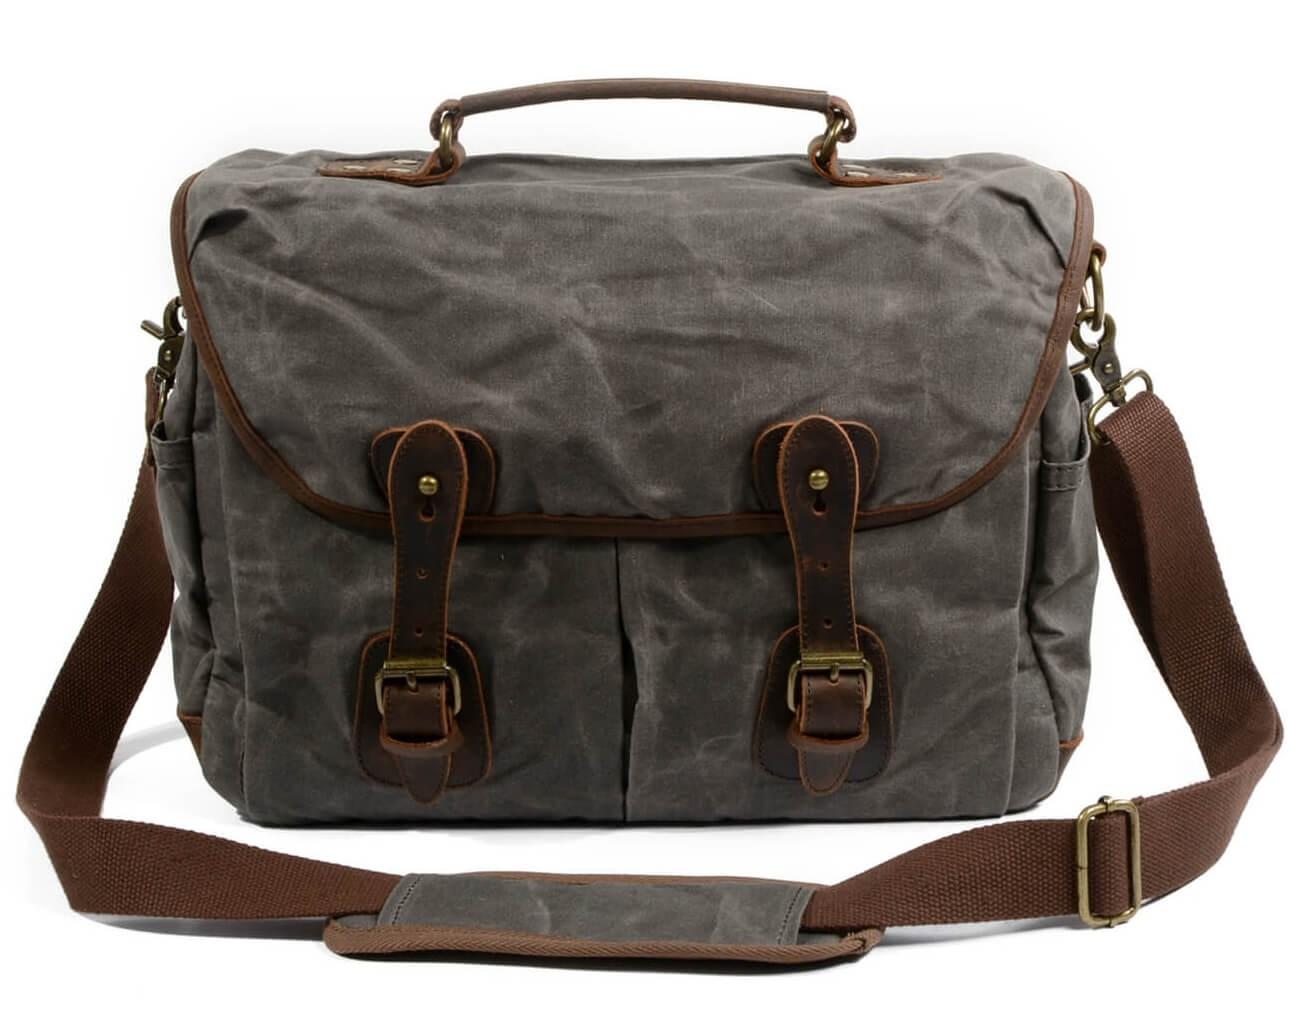 b469a048a3563 ☆ Chlebak WAX TRAVELLER™ Męska torba na ramie bawełniano - skórzana